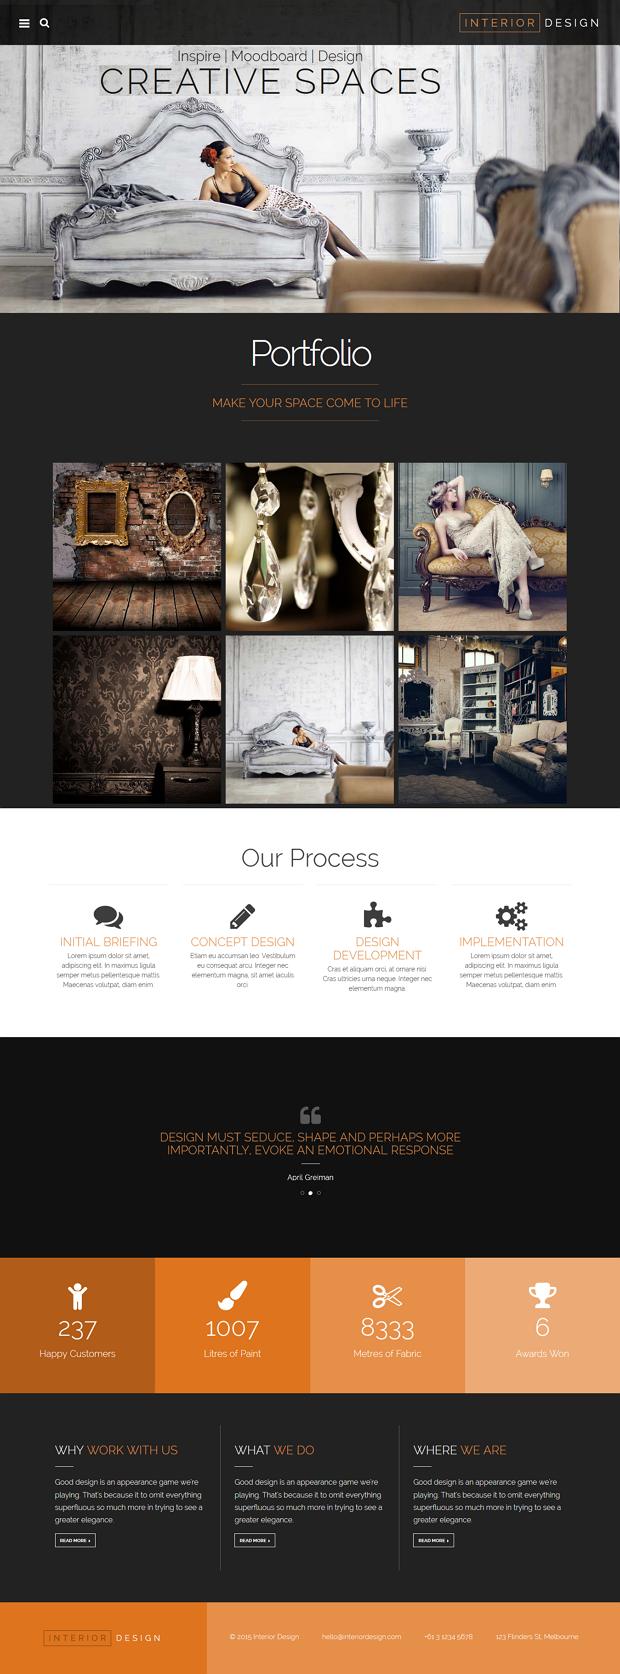 7 beautiful interior design bootstrap themes webdesign inspiration rh pinterest com